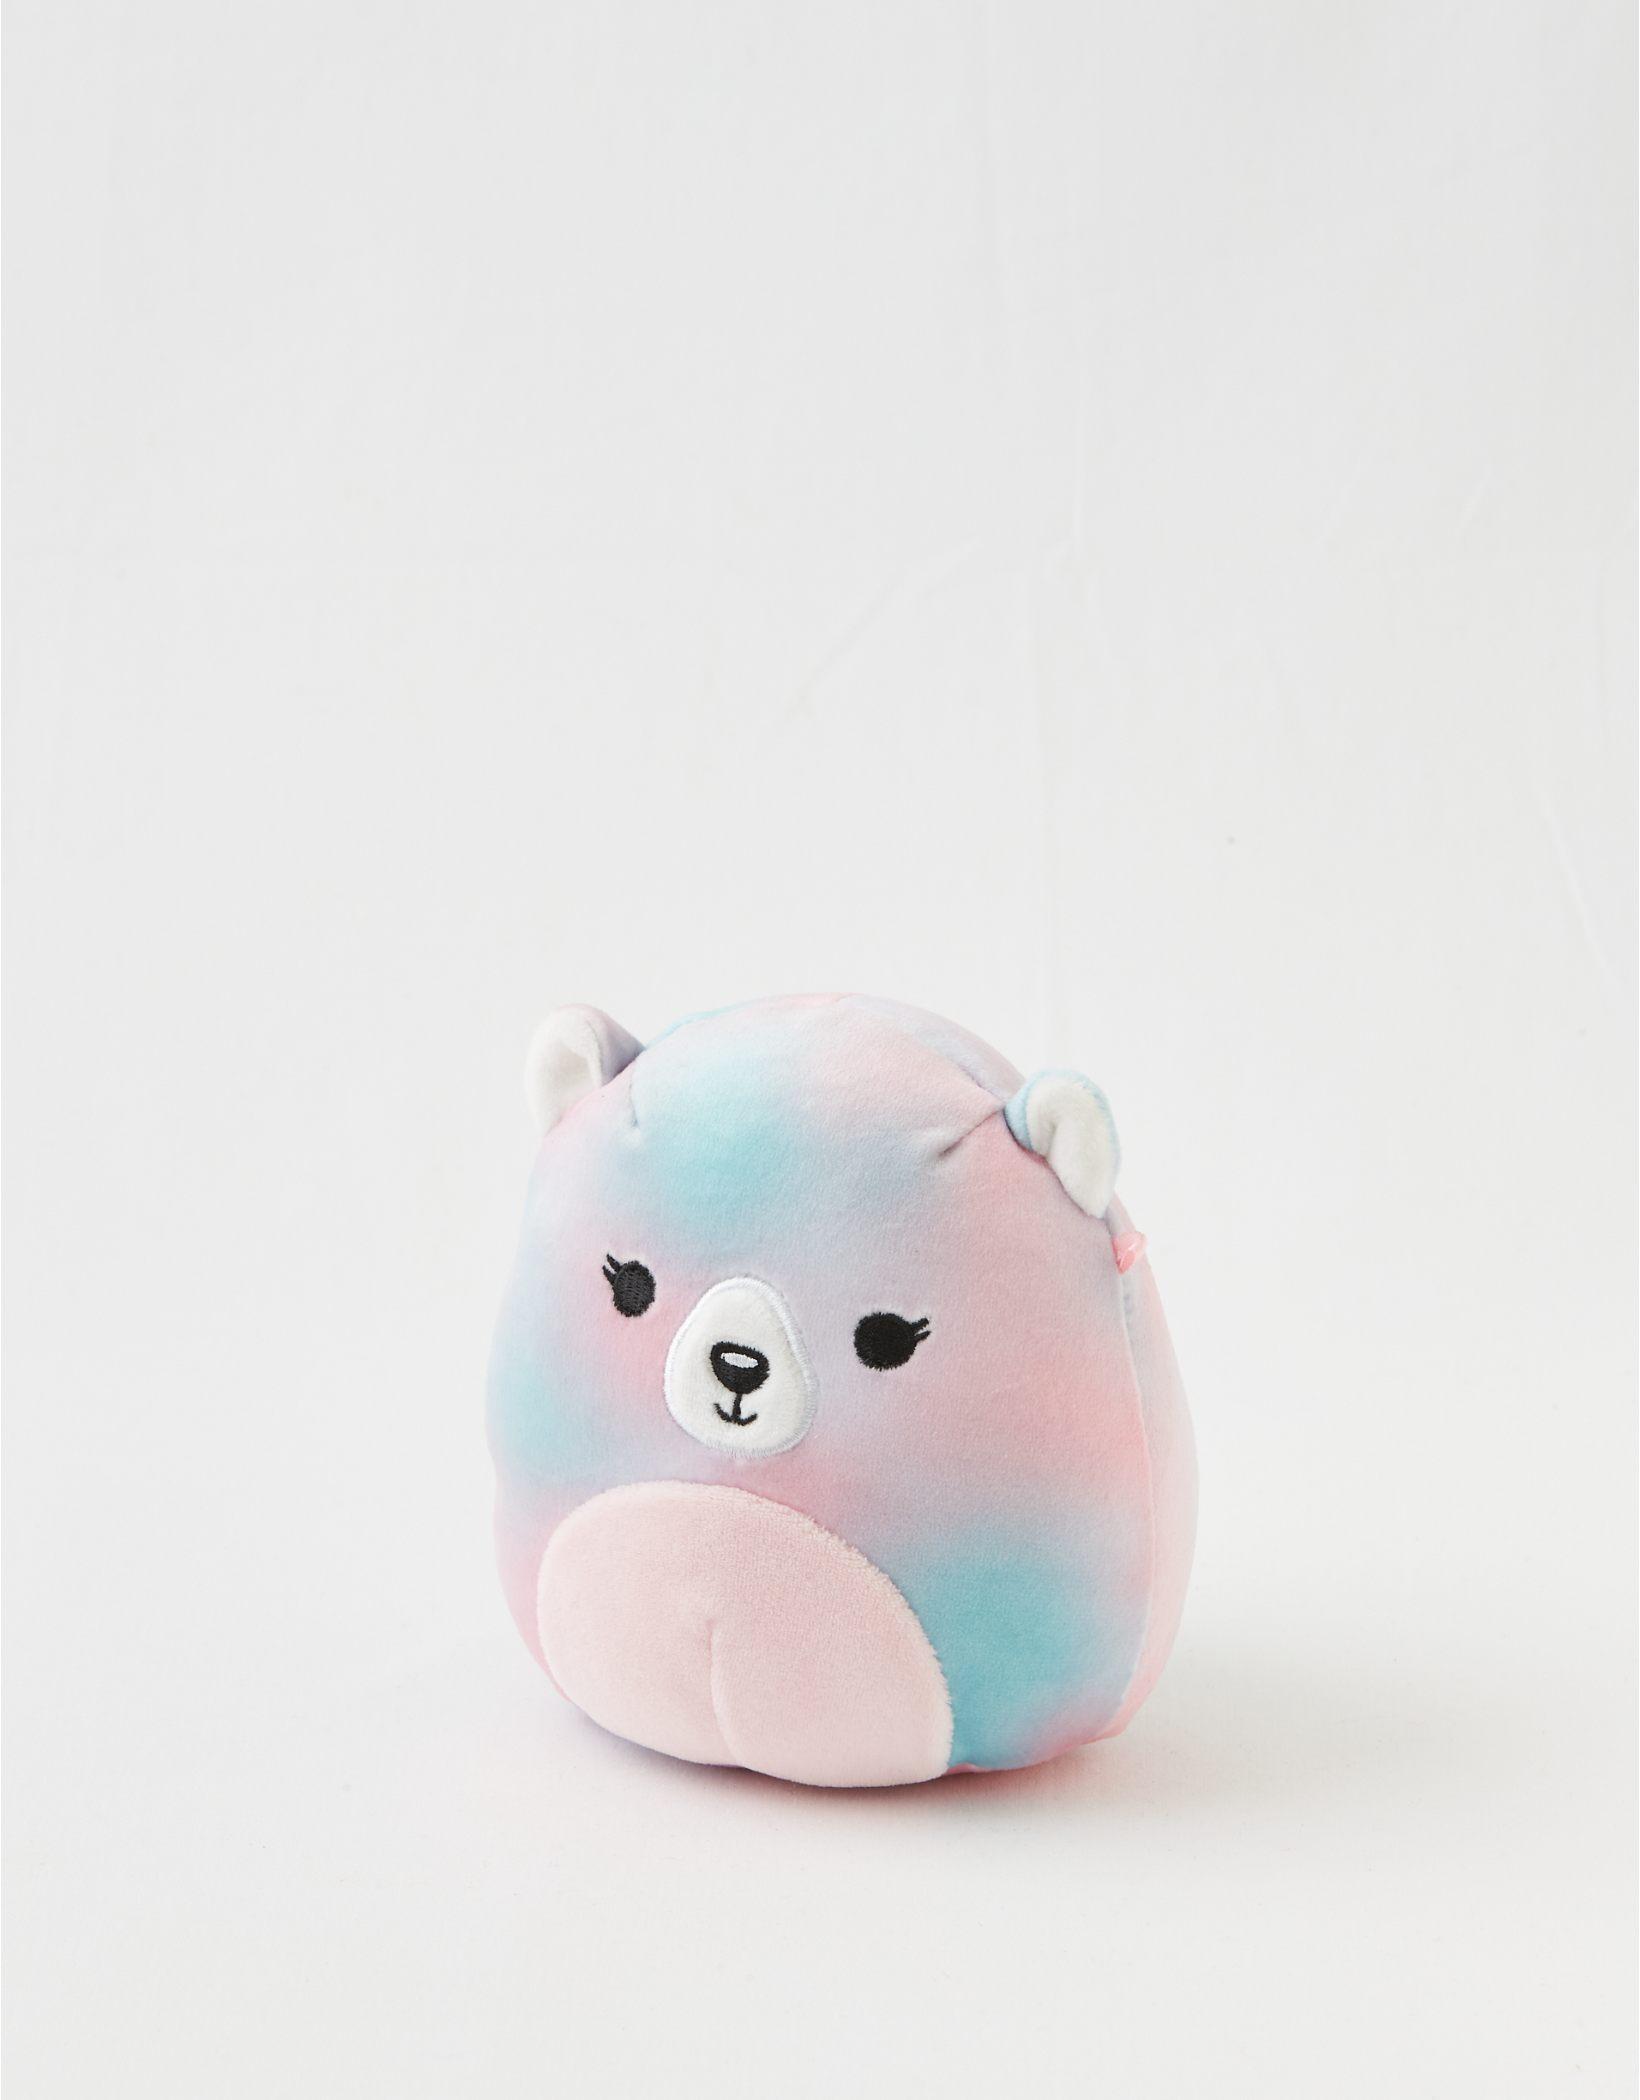 Squishmallow 5 in Plush Toy - Tula